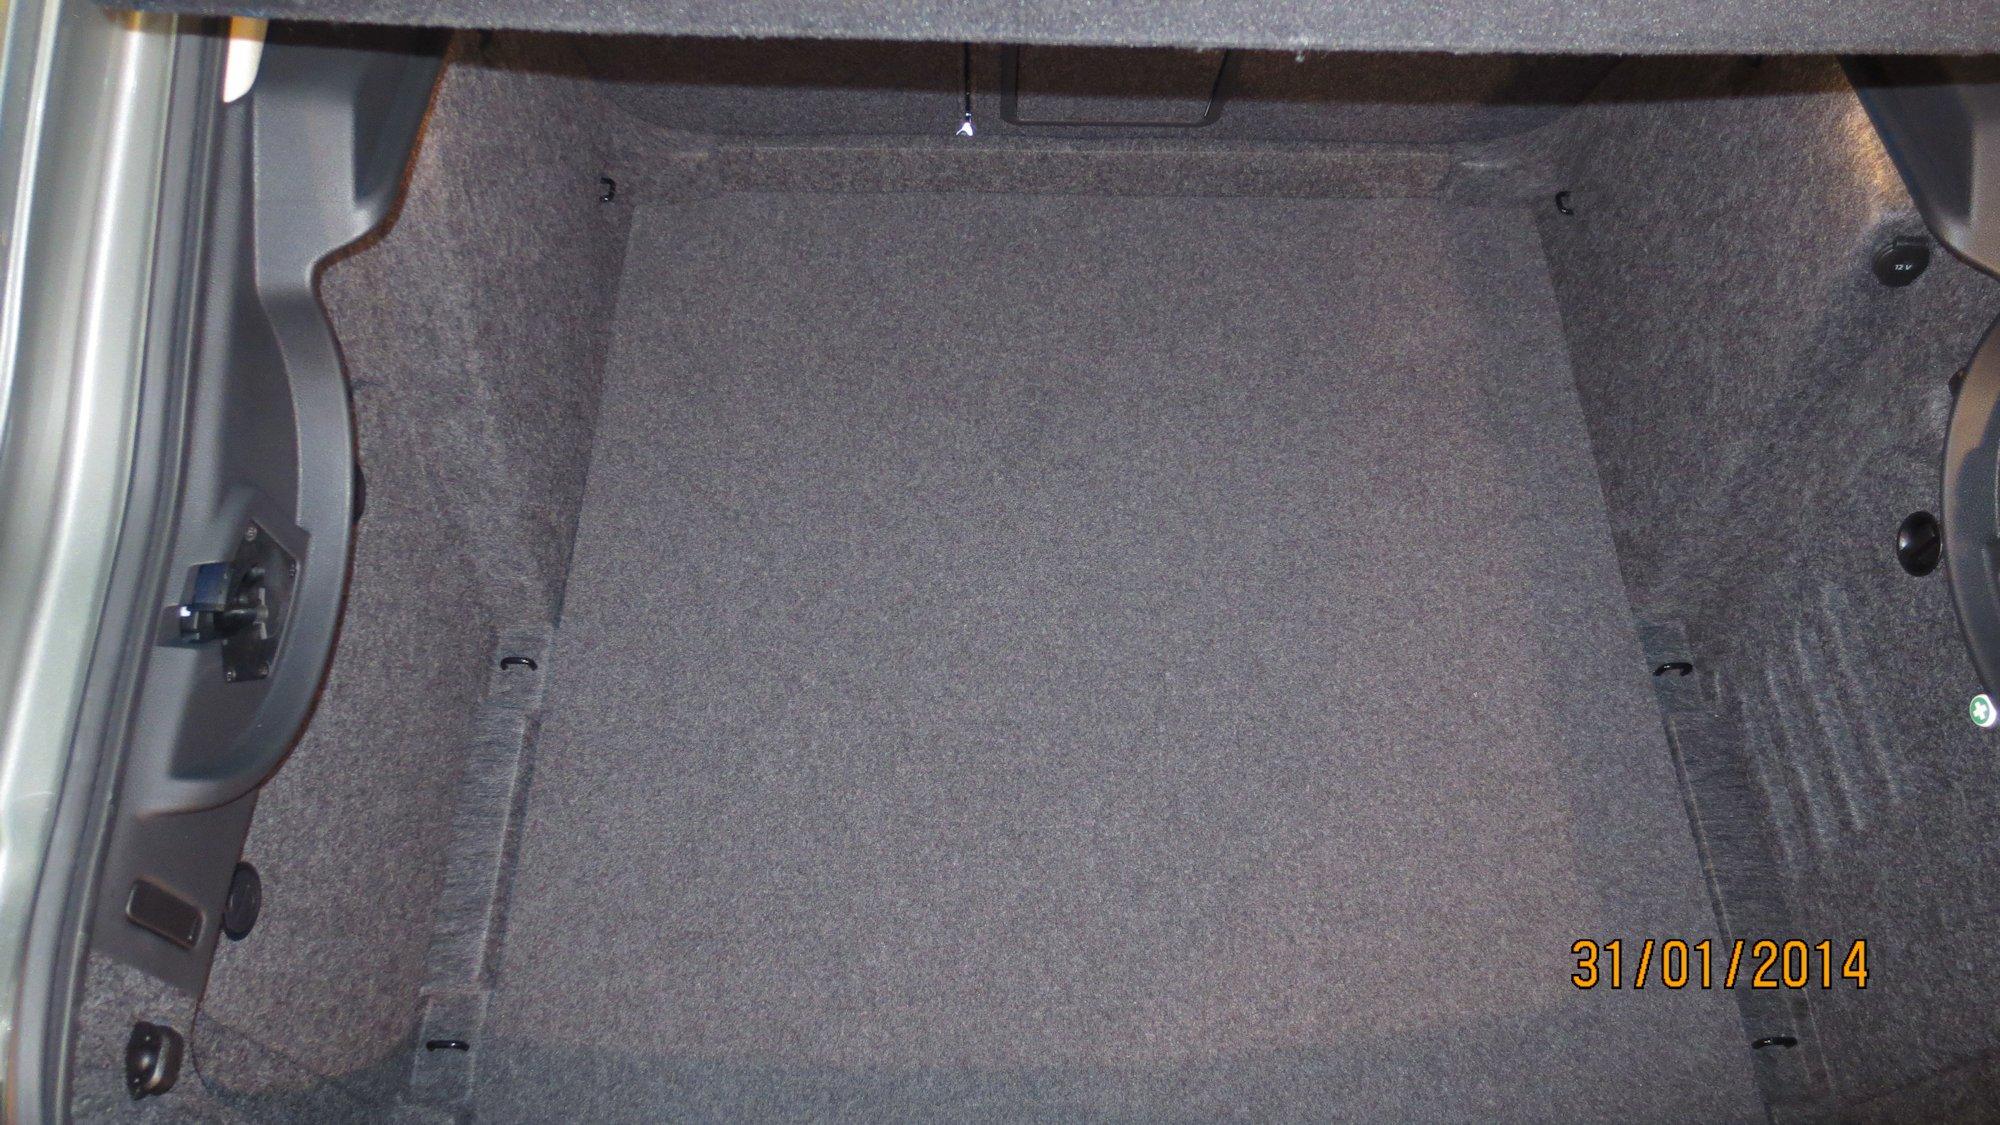 notrad beim fl 3 6l sonderfall seite 2. Black Bedroom Furniture Sets. Home Design Ideas